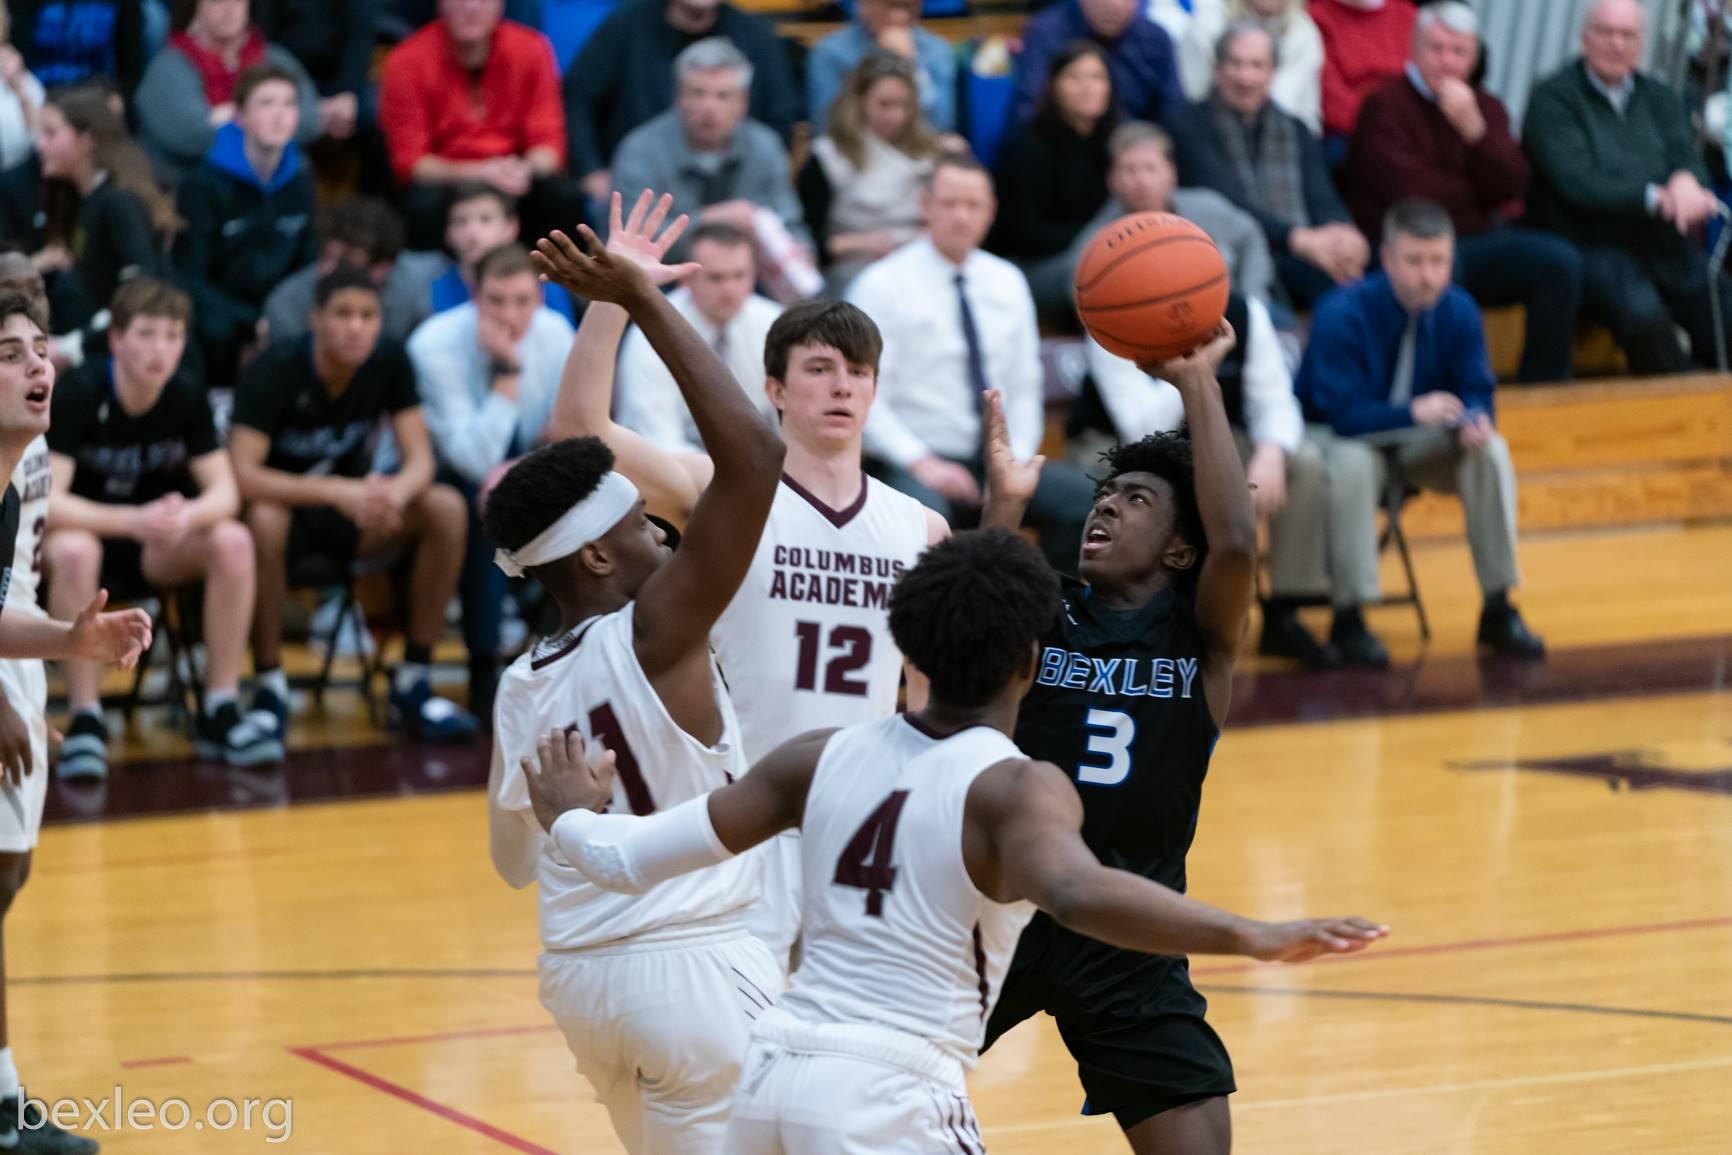 Boys Basketball player shoots vs Columbus Academy